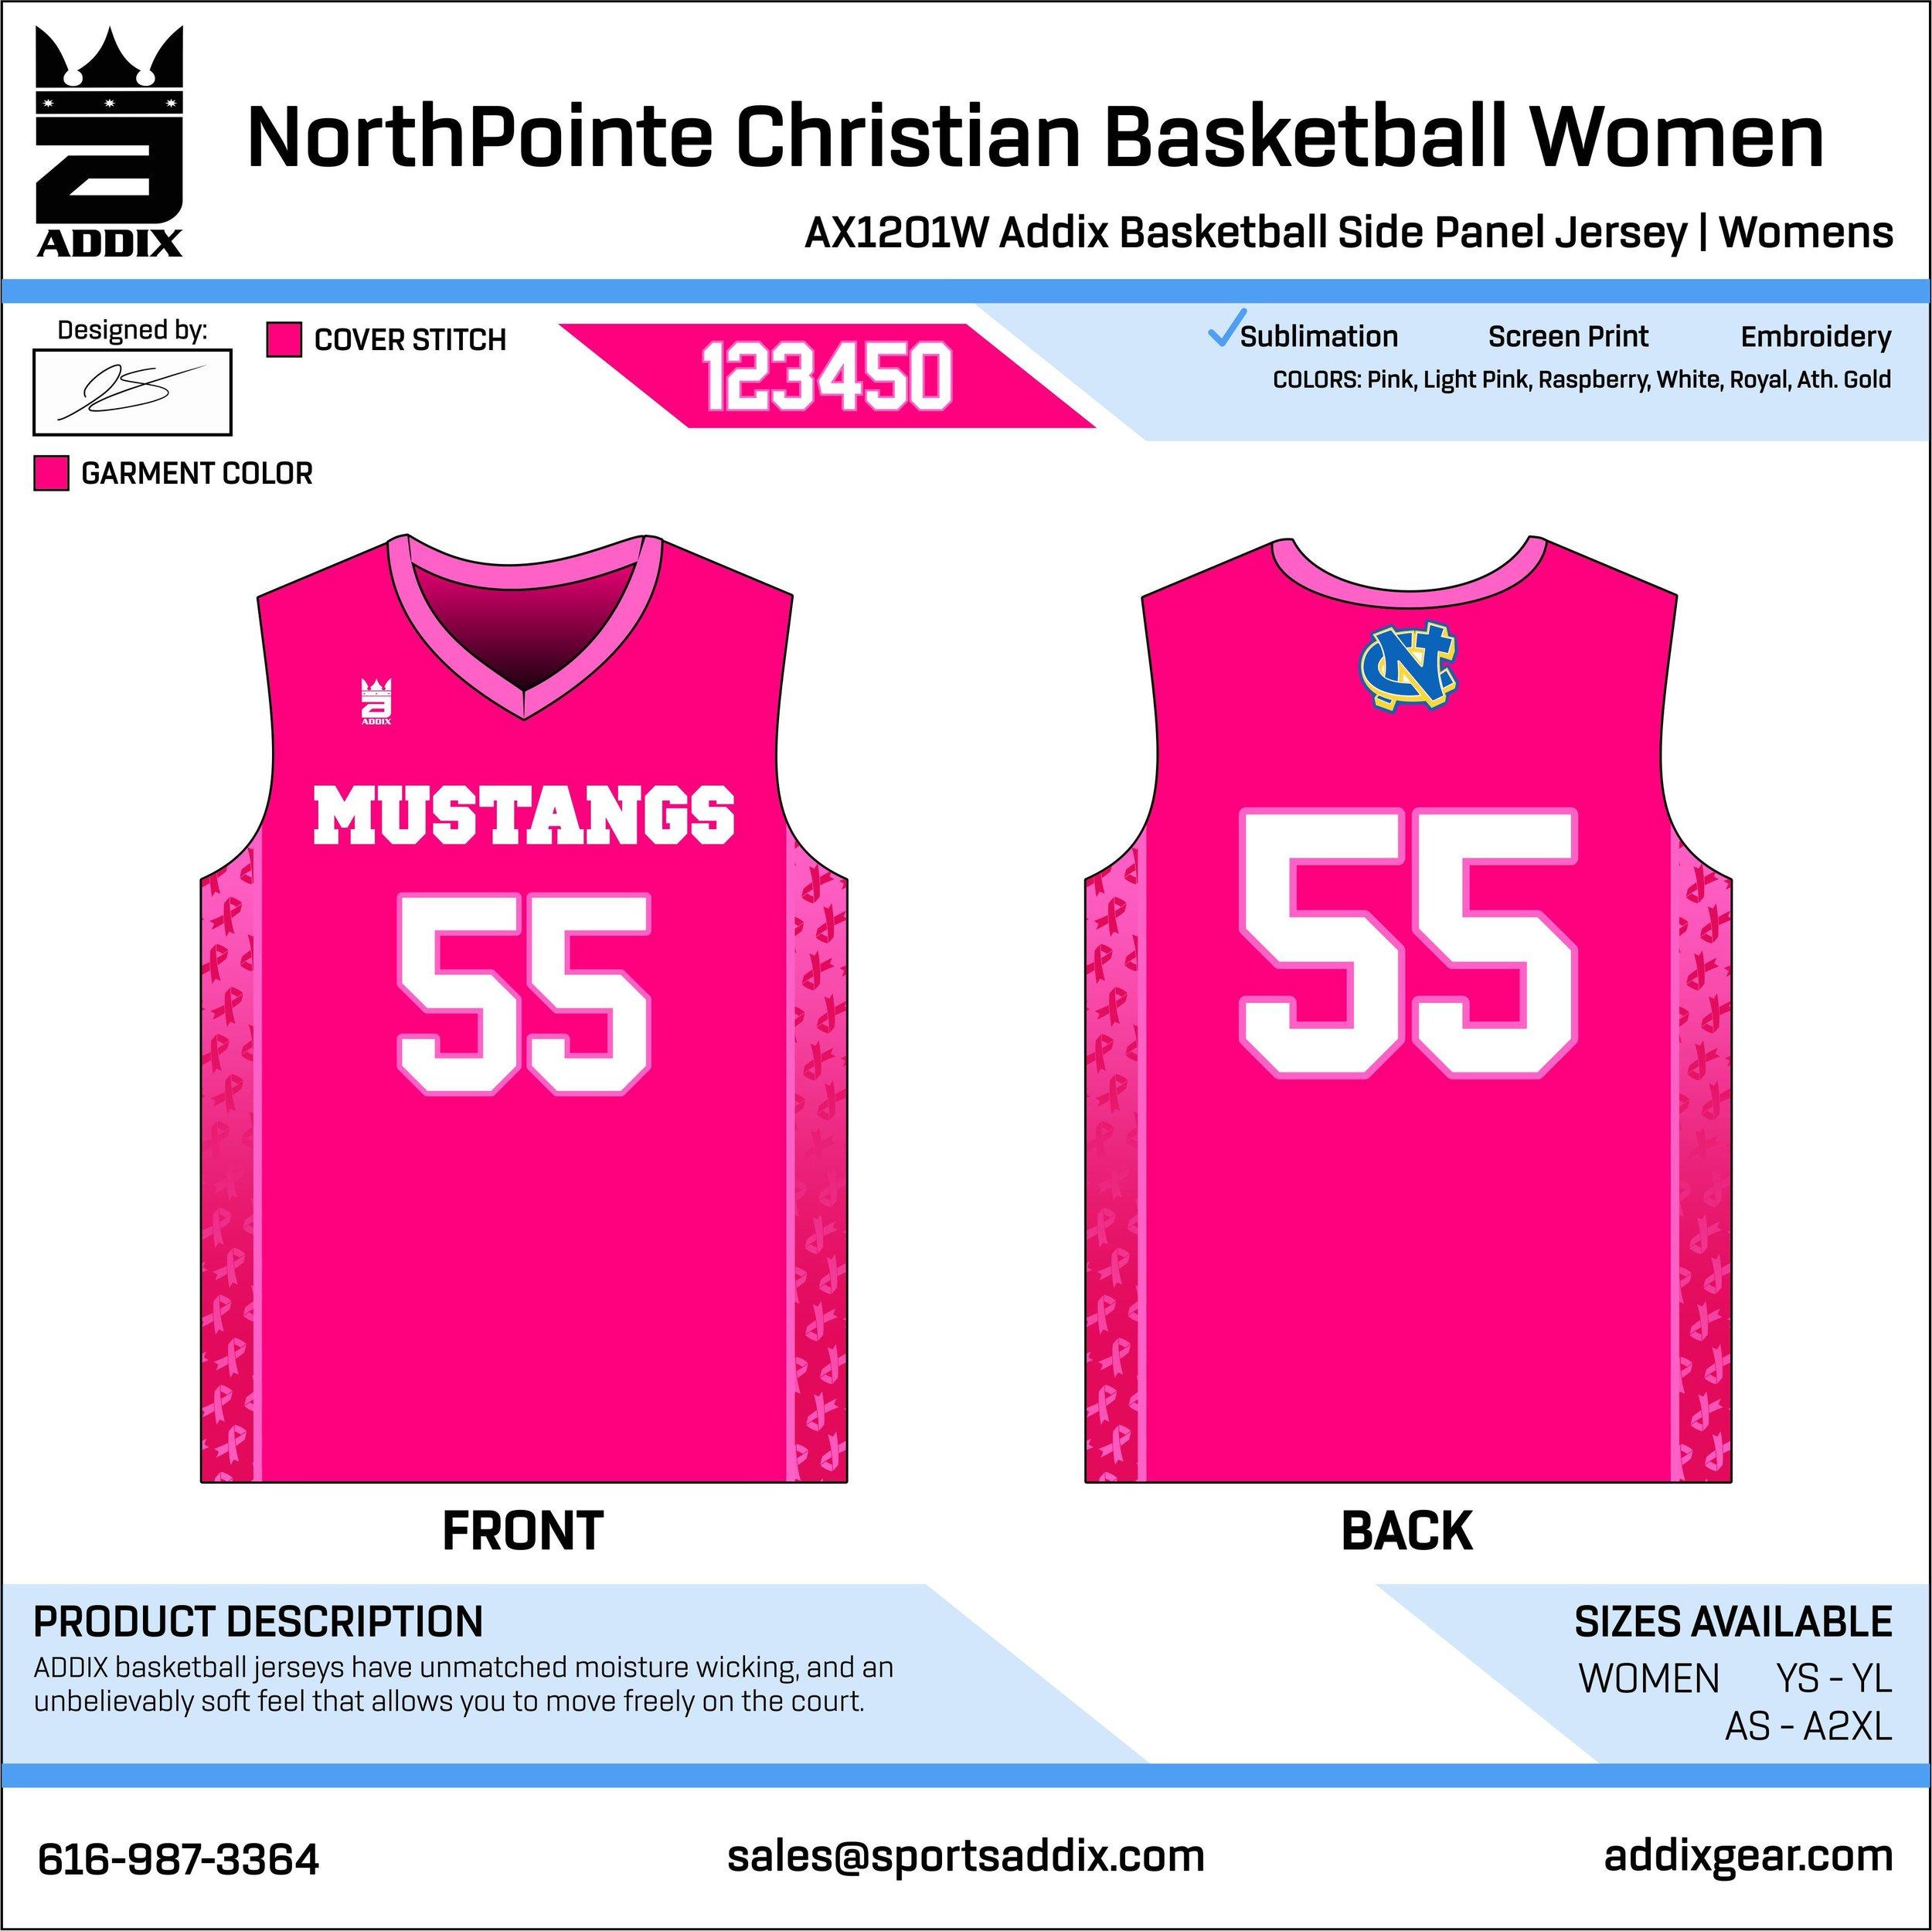 NorthPointe Christian Basketball Women_2018_2-13_JE_Basketball Jersey V2.jpg